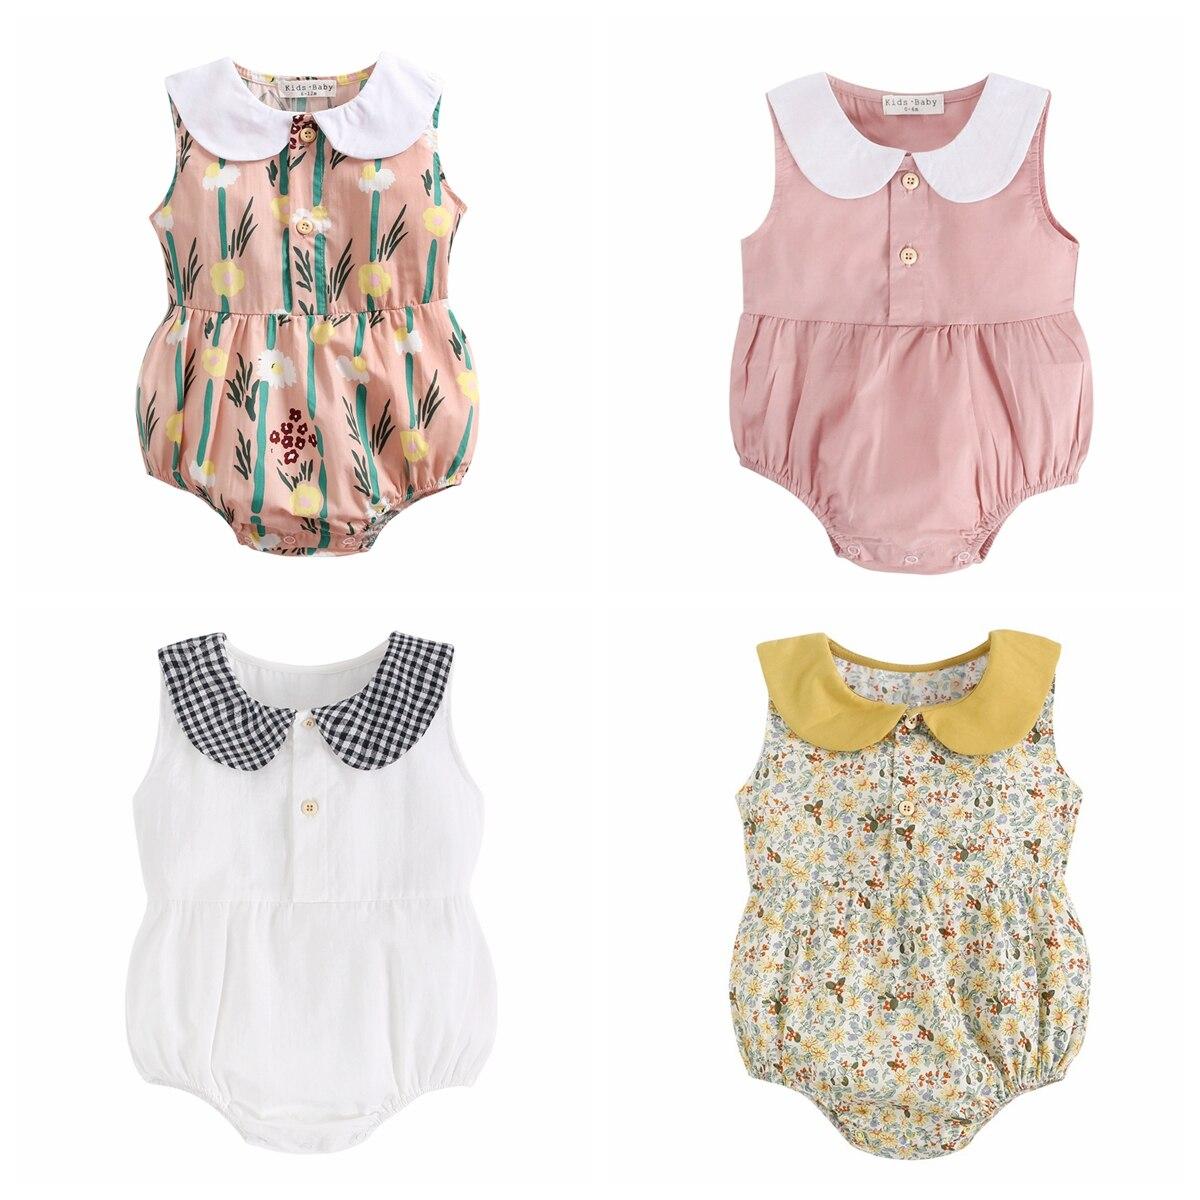 Sanlutoz Newborn Princess Baby Girls Bodysuits Cotton Baby Summer Clothing Cute Flowers Infant Clothes